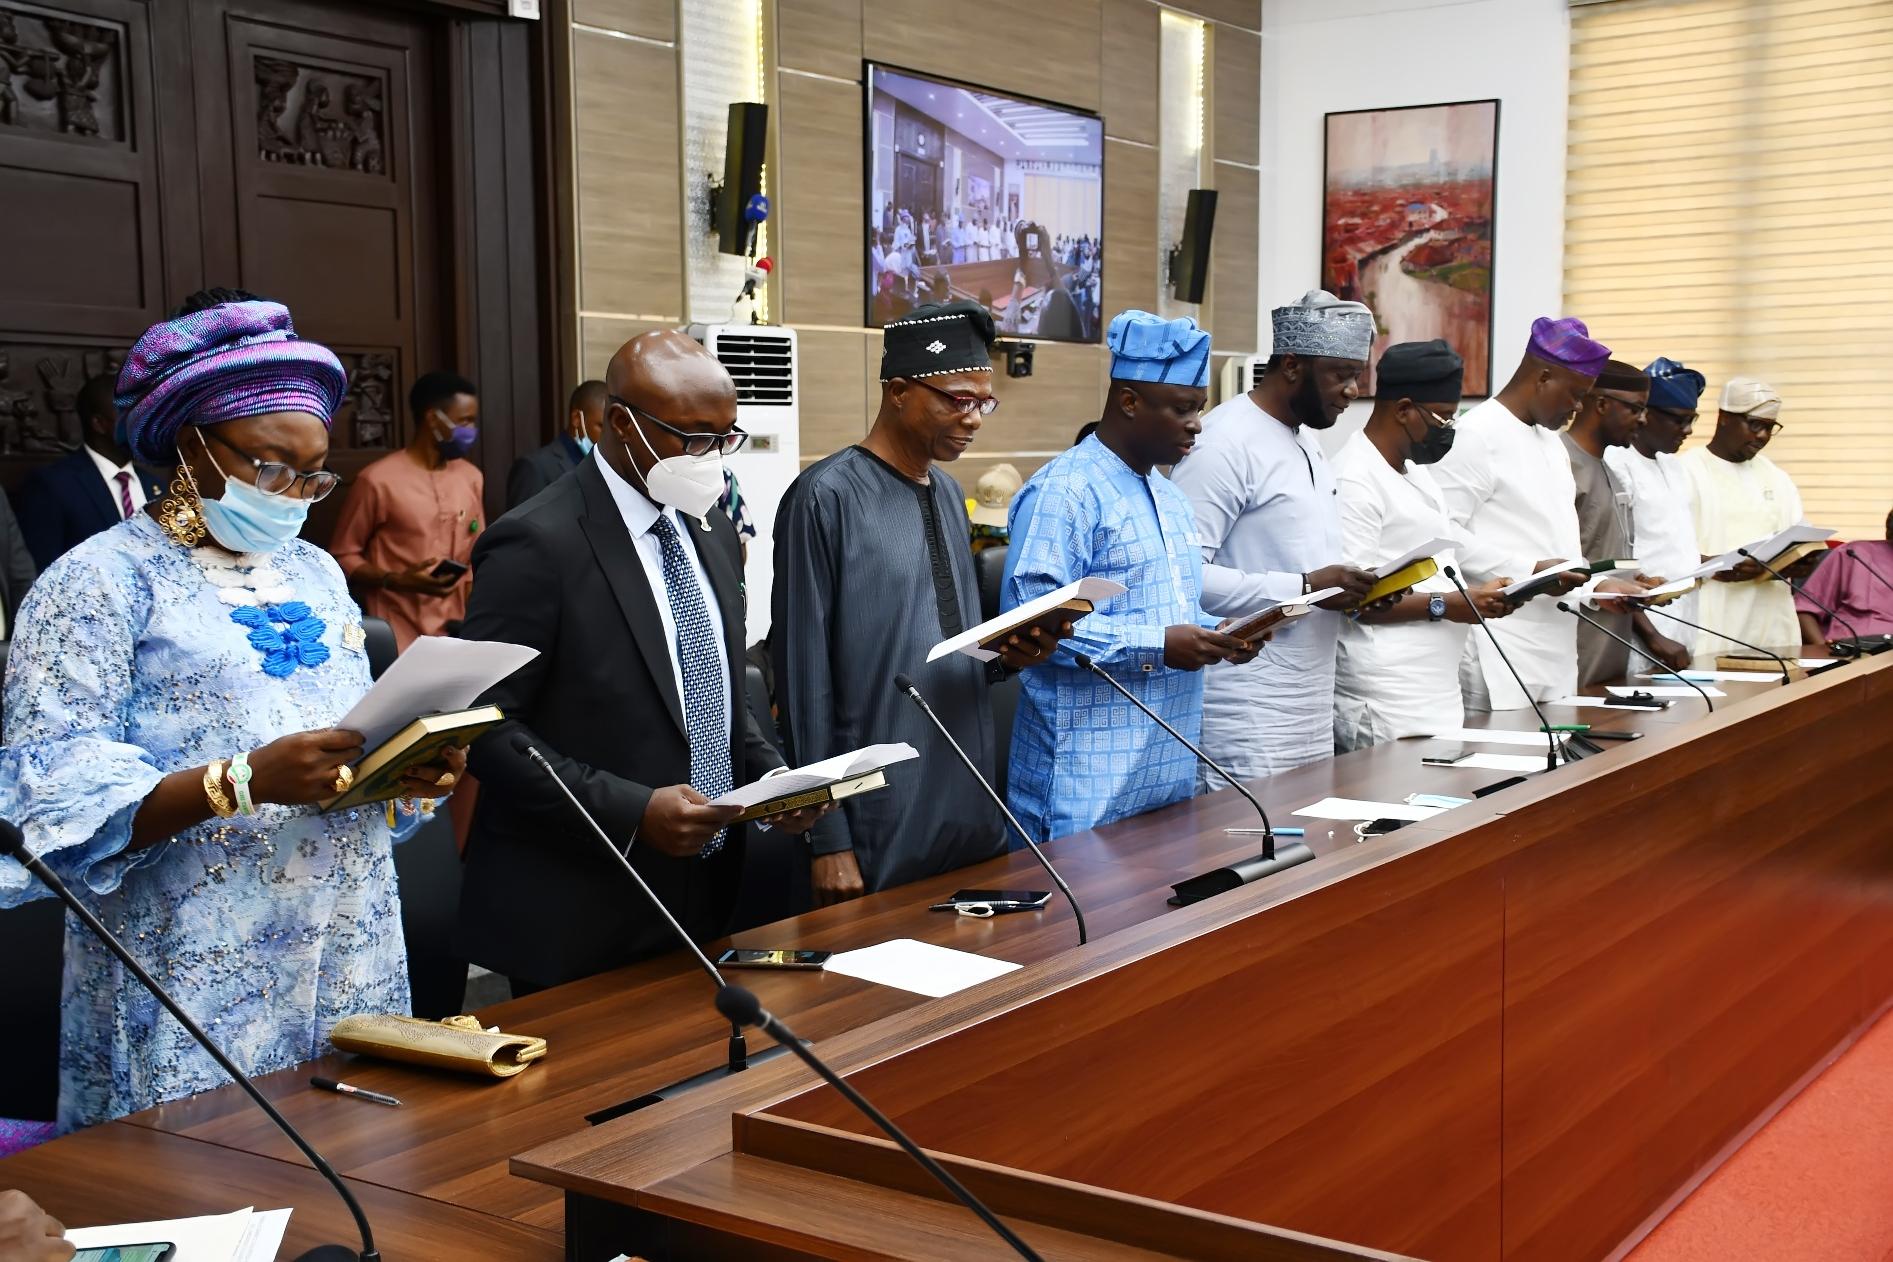 The Newly and re-appointed Commissioners, from left, Alhaja Kafilat Olayiwola; Dr Taiwo Ladipo; Mr Olusegun Olayiwola; Prof Musibau Babatunde; Mr Segun Oni; Barr. Abiodun Abdul-Raheem; Dr Wasiu Olatunbosun; Barr. Olasunkanmi Olaleye; Mr Adeniyi Adebisi and Seun Fakorede taking the oat during their swearing-in as Commissioners in Oyo State held at Governor's Office, Secretariat, Ibadan.